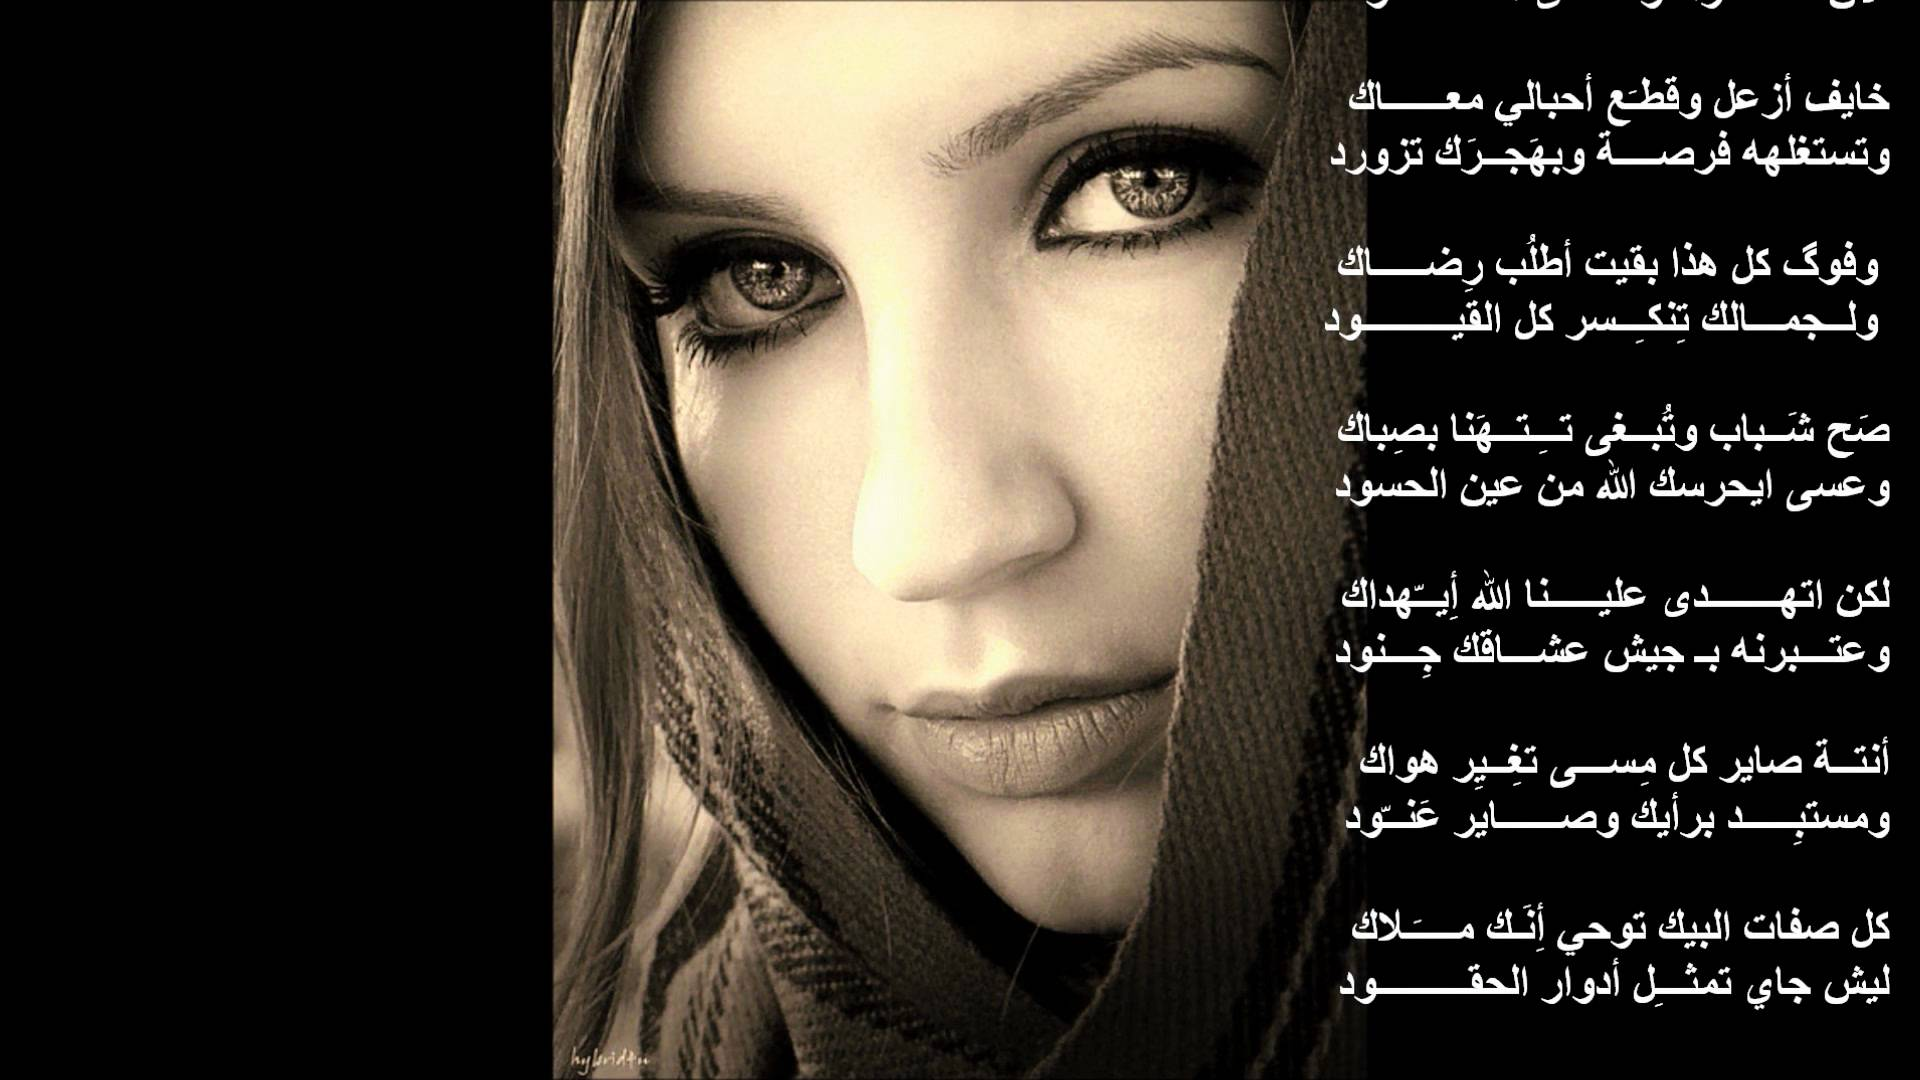 بالصور شعر غزل عراقي , اجمل كلمات حب 2525